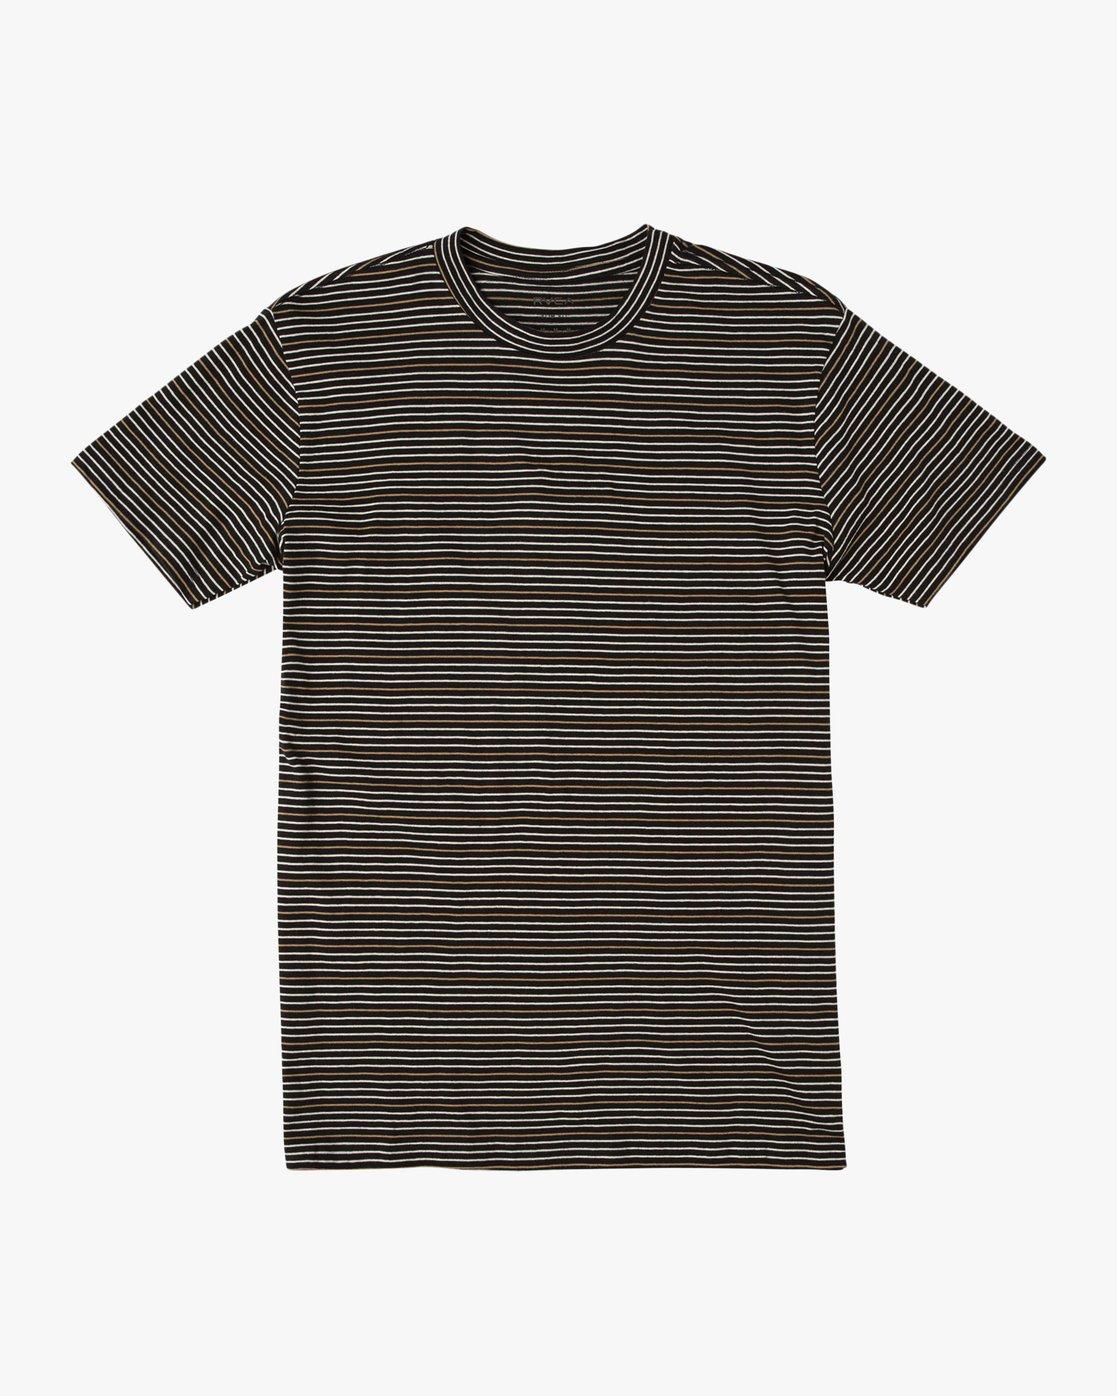 0 Curren Caples Benson Striped T-Shirt Black M908QRBS RVCA